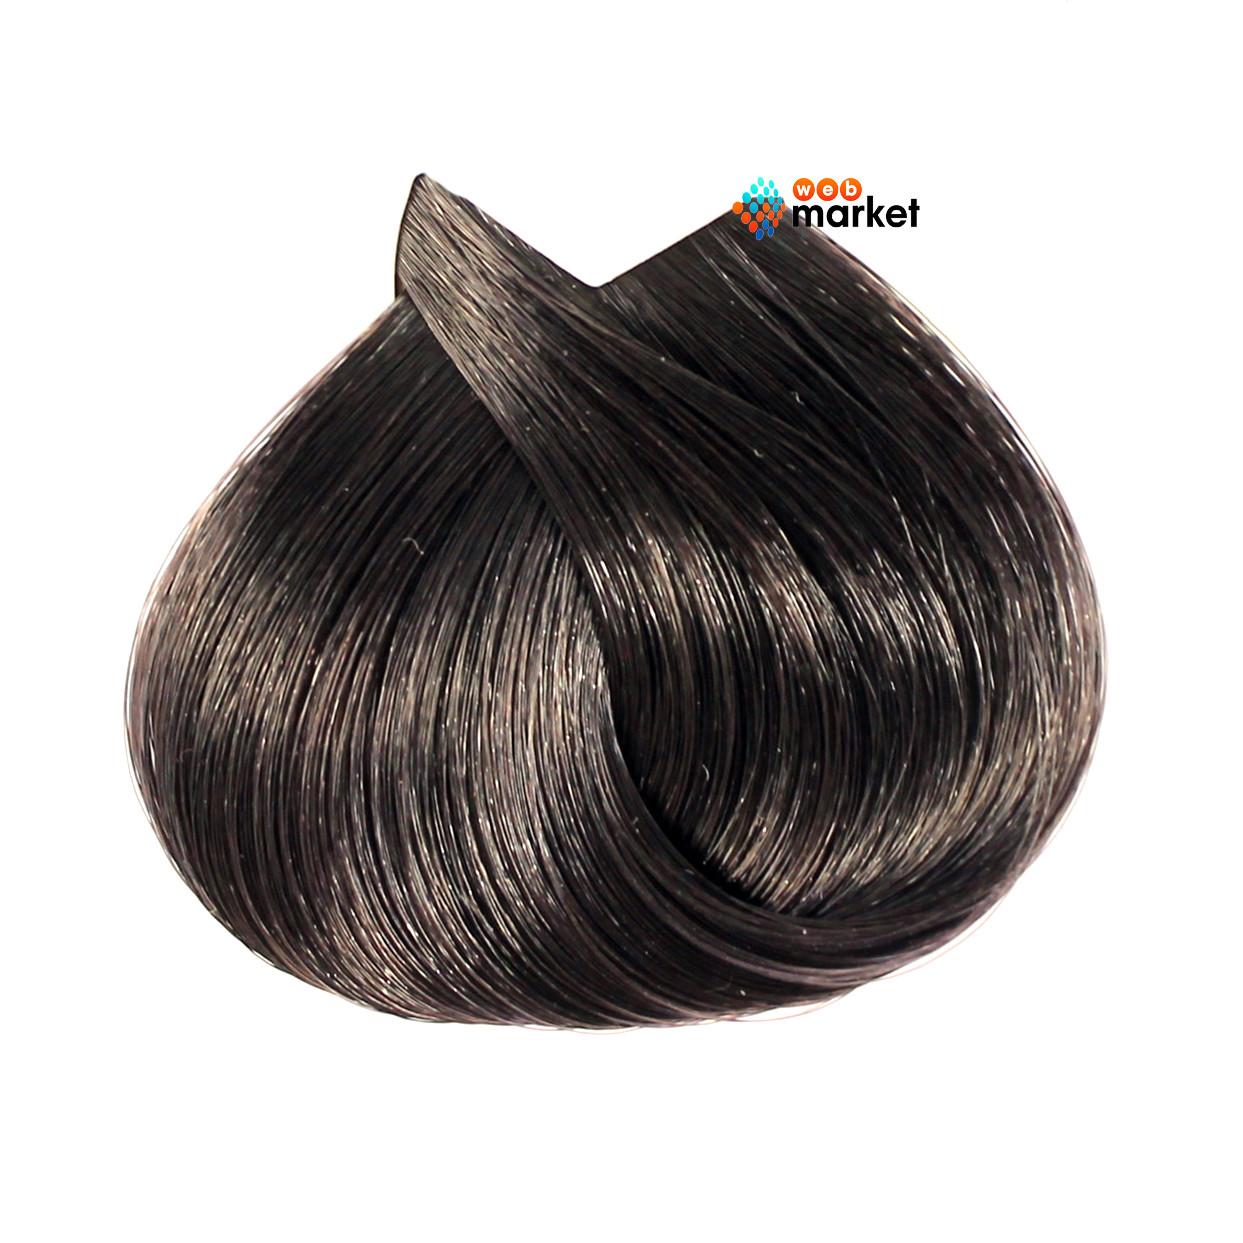 Краска для волос L'Oreal Majirel 3.0 темный шатен глубокий 50 г